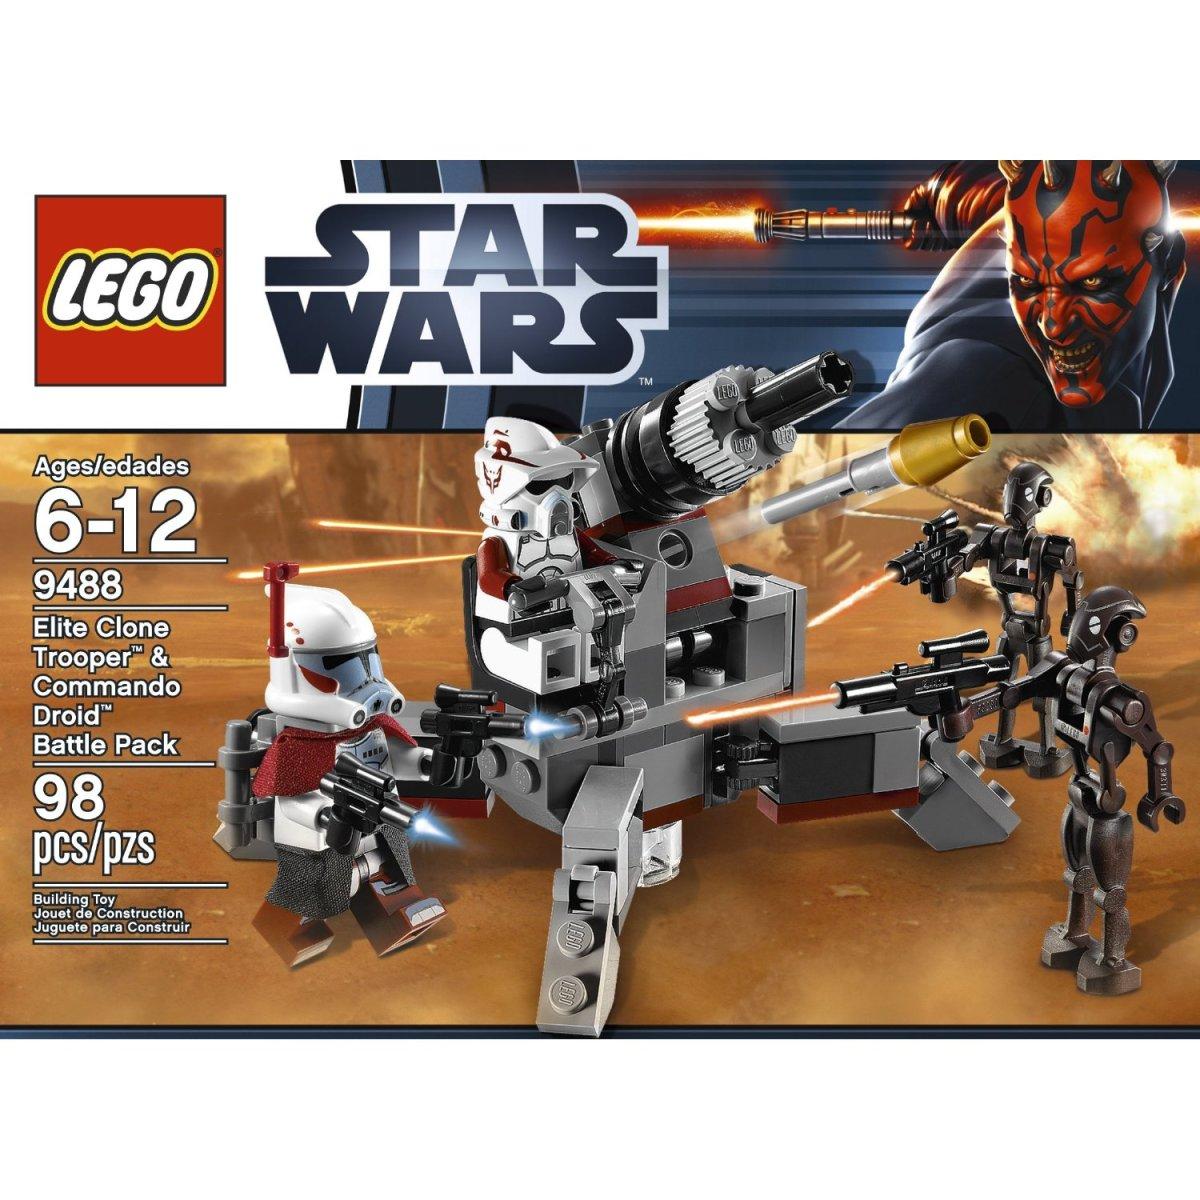 LEGO Star Wars Elite Clone Trooper & Commando Droid Battle Pack 9488 Box